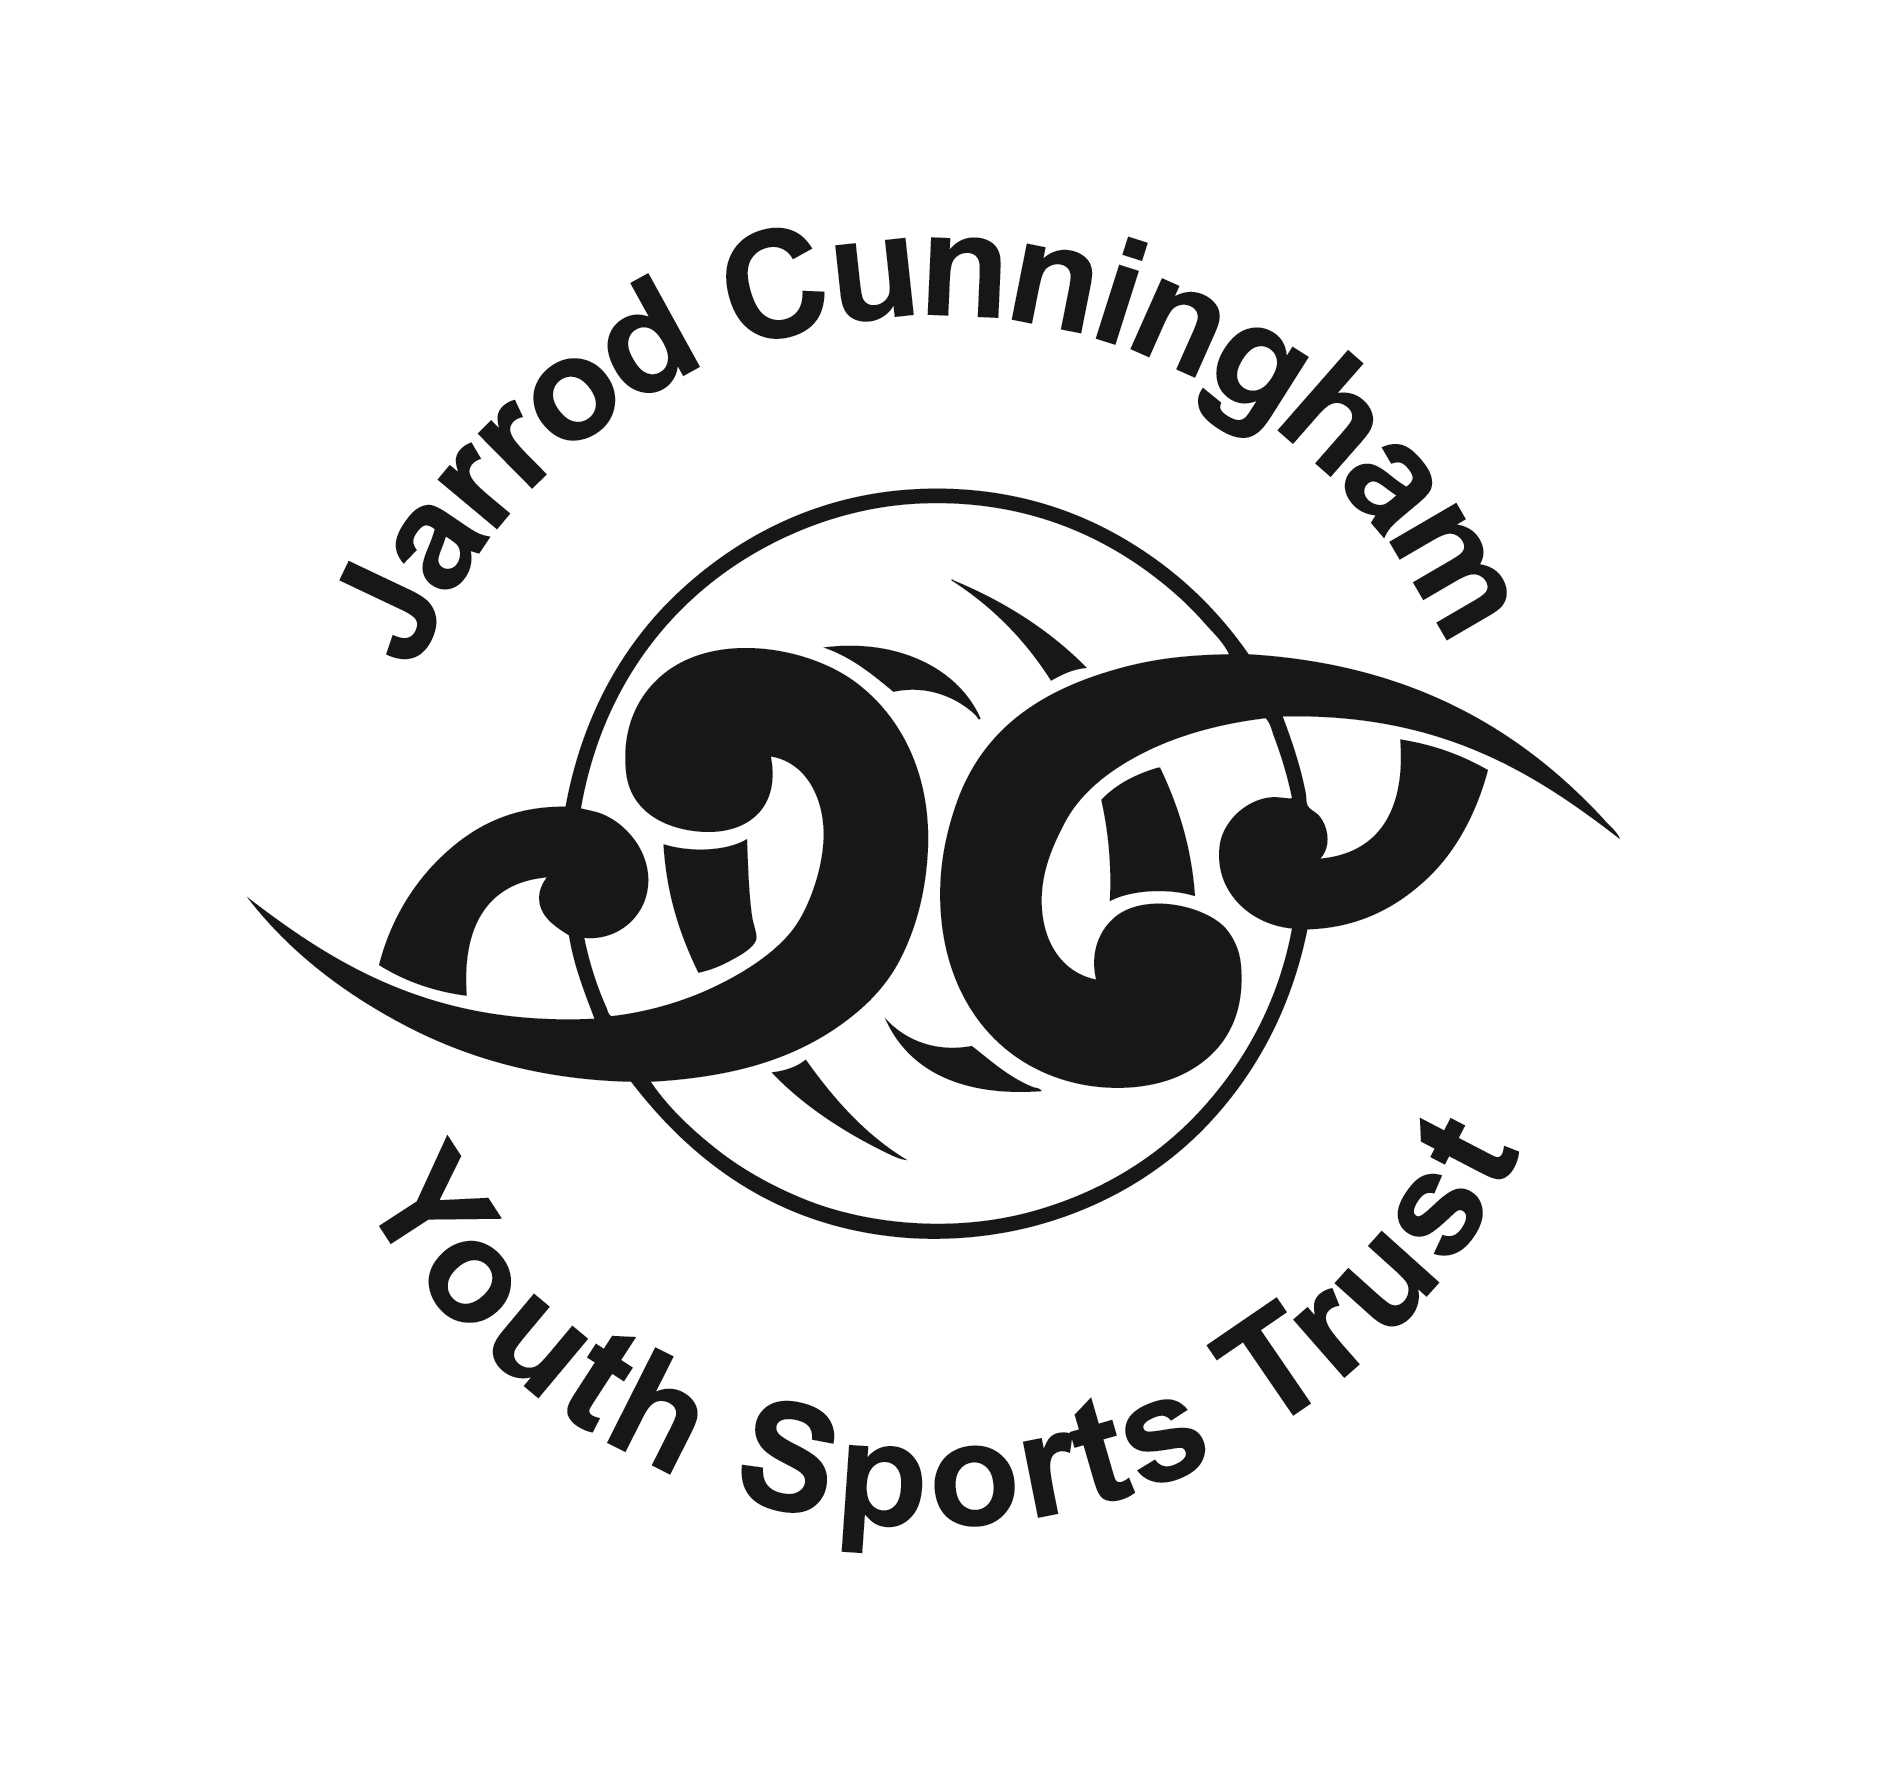 1884x1778 New Sport Scholarship Announced